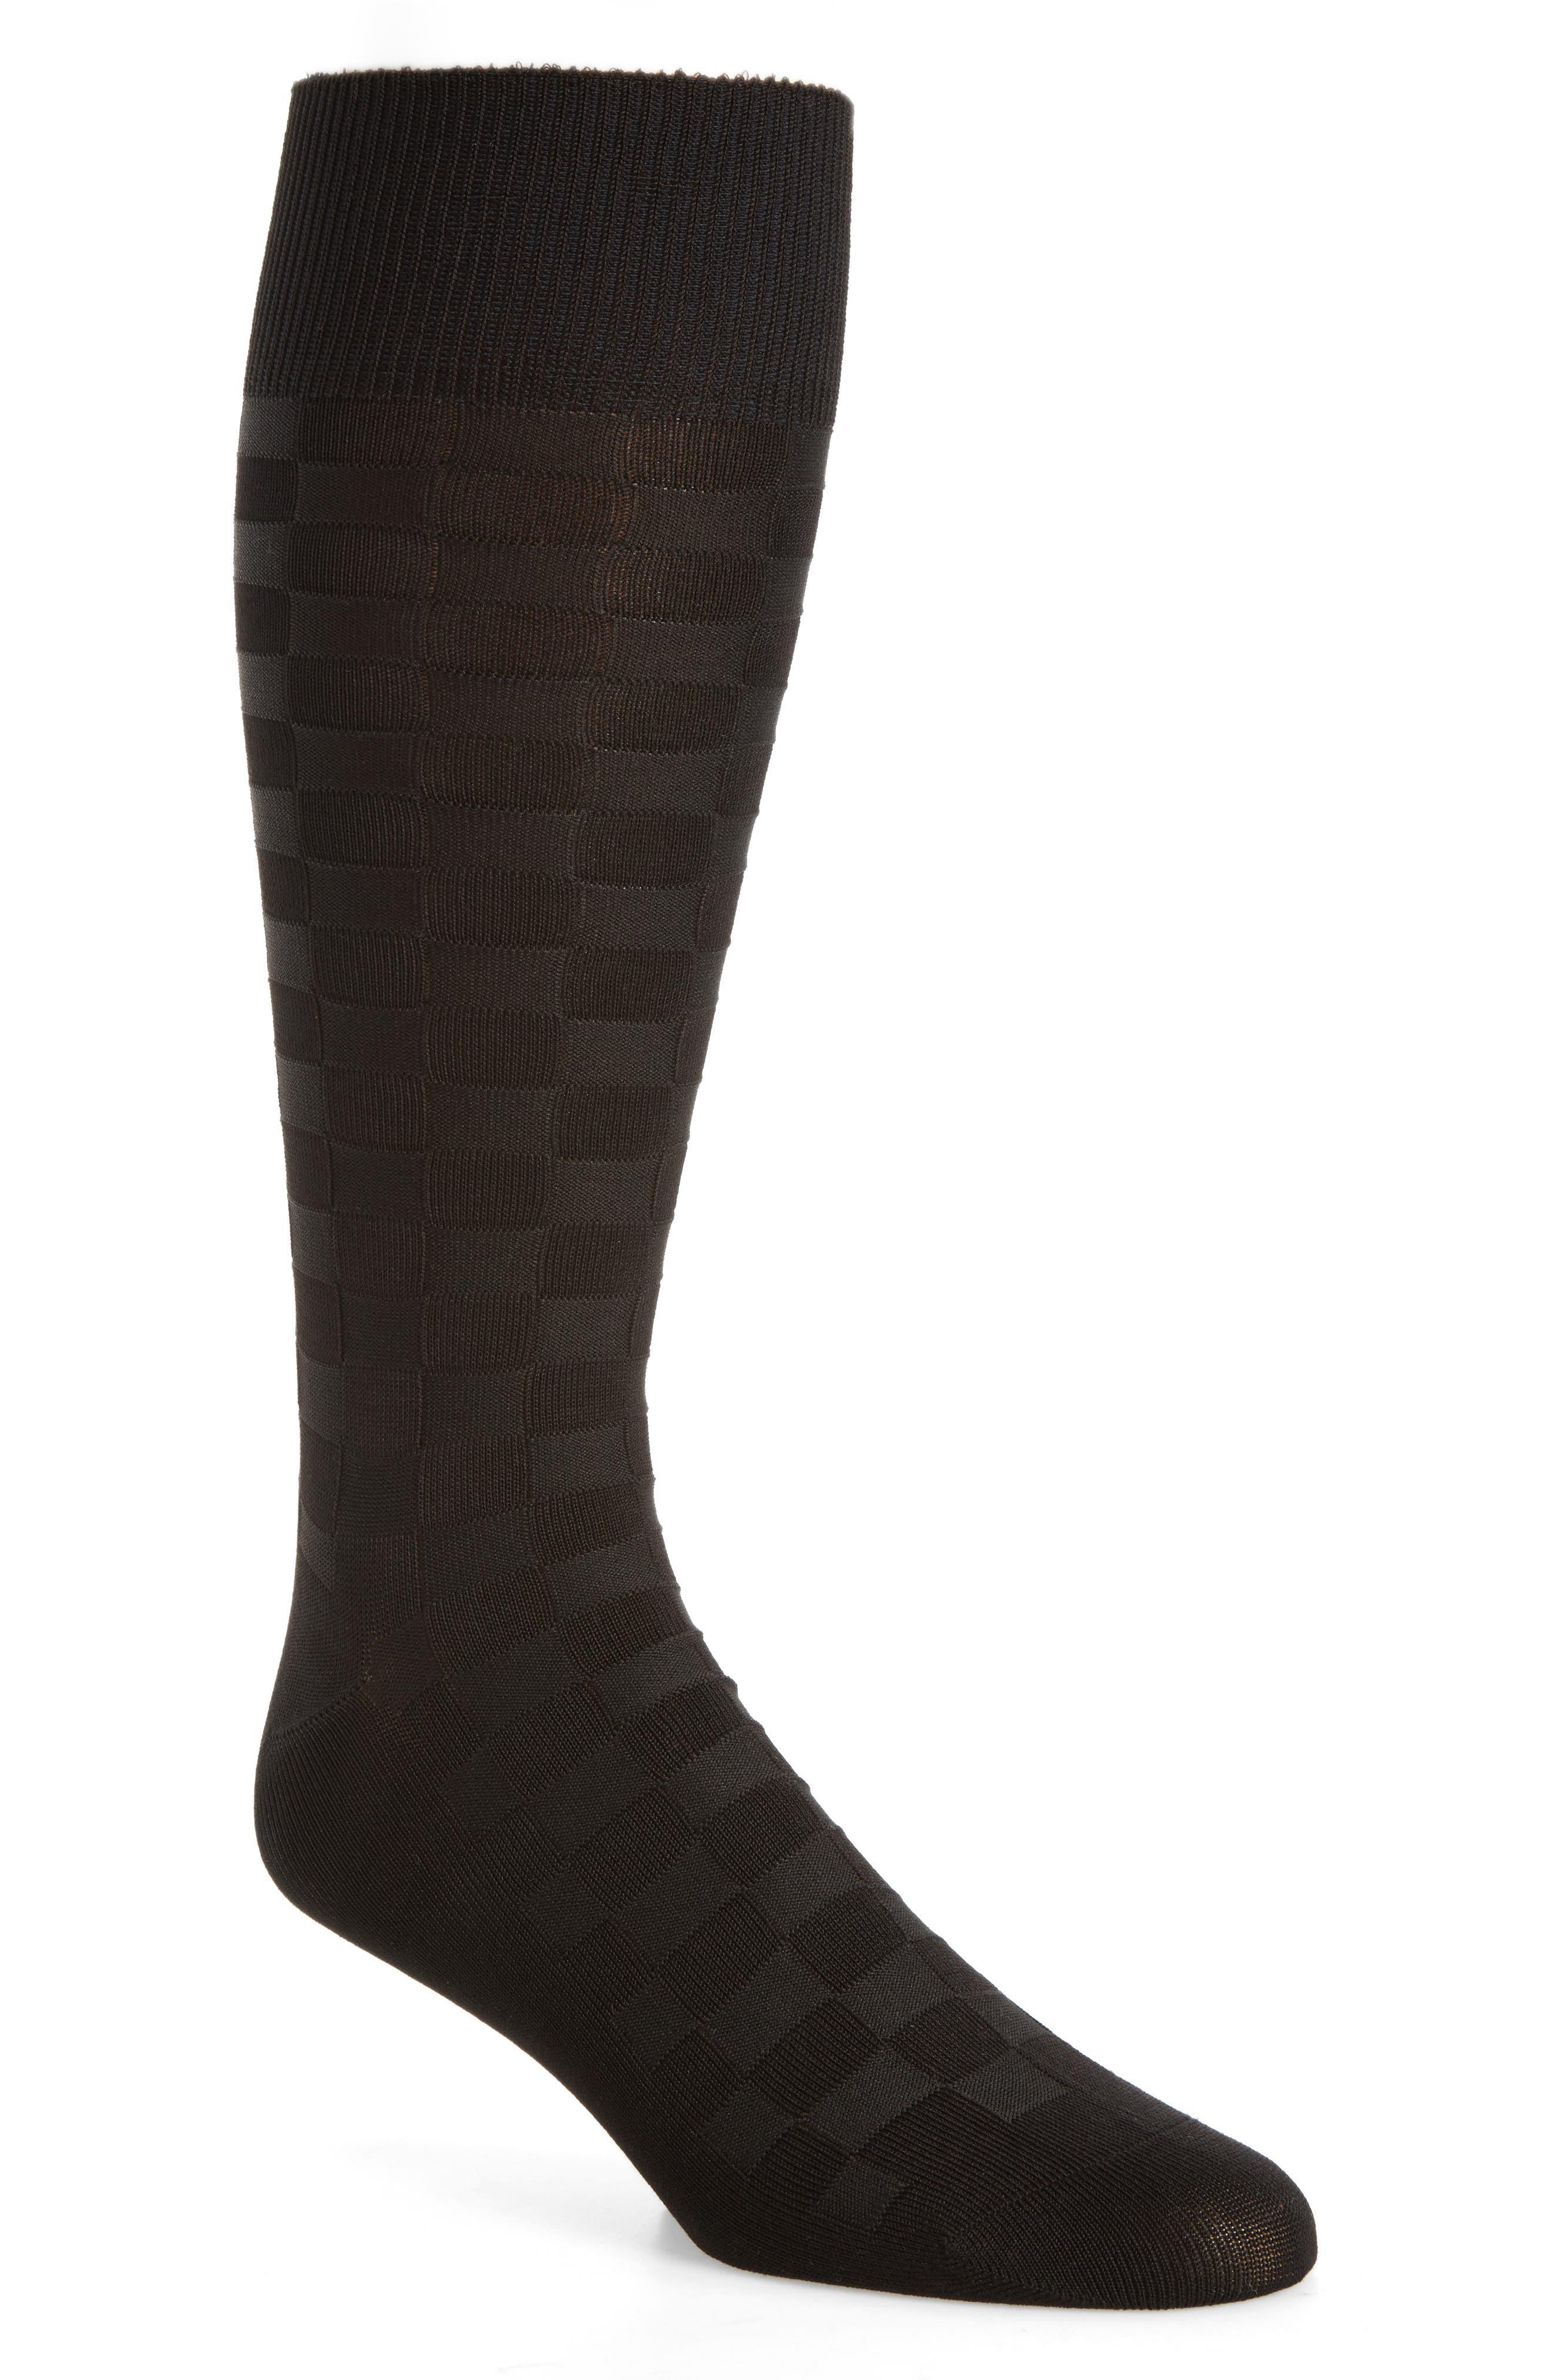 Grid Socks,                         Main,                         color, Black